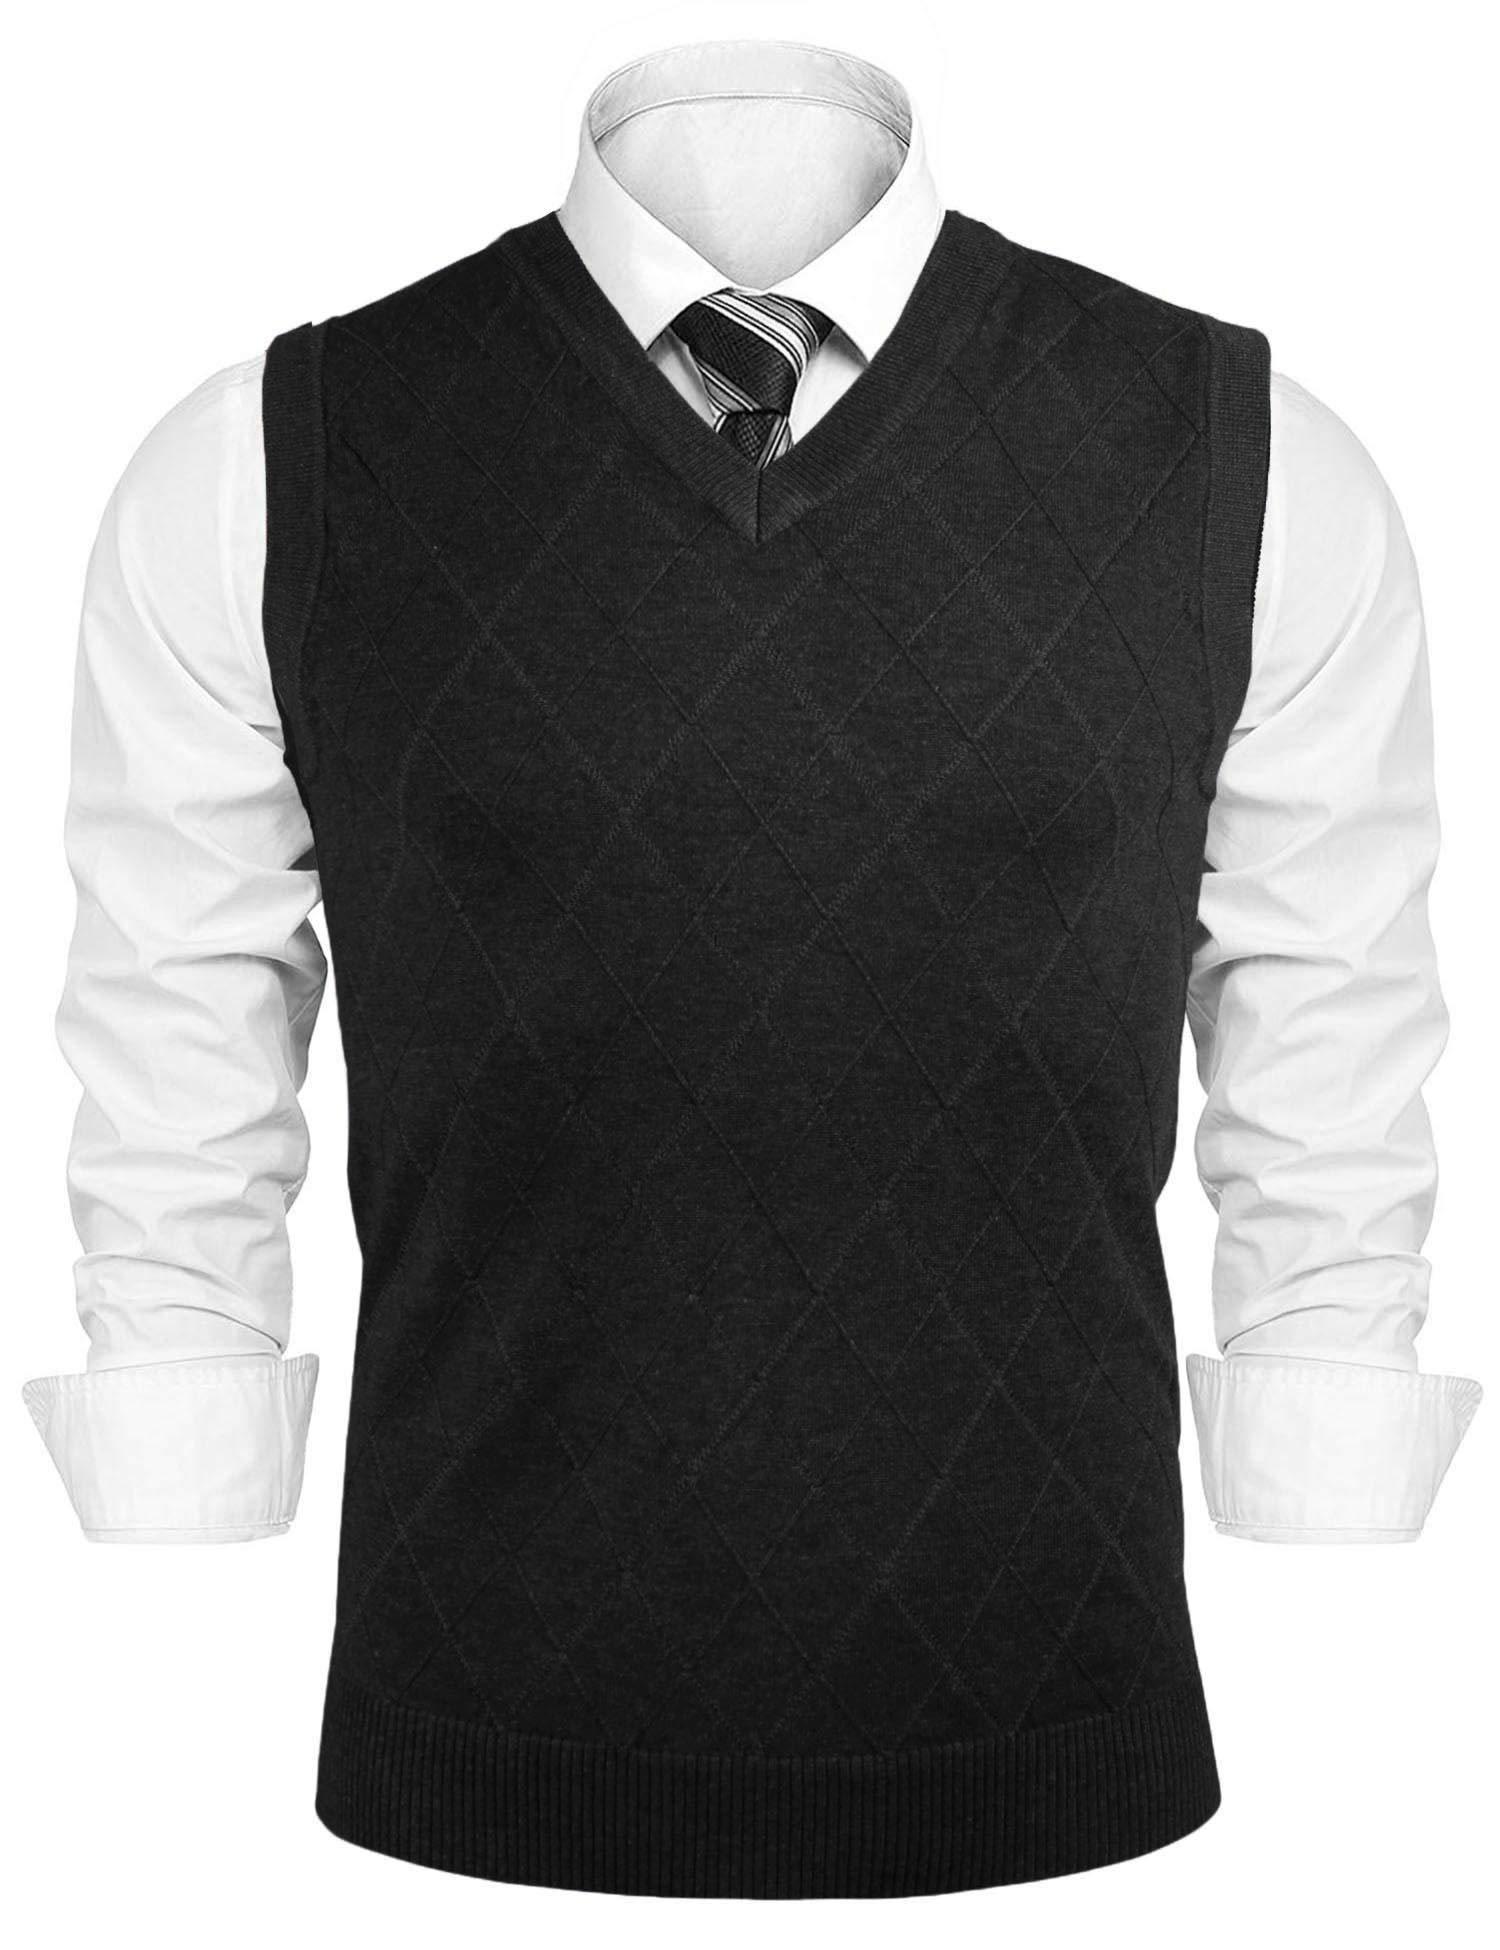 Aibrou Men's V-Neck Argyle Sweater Vest Sleeveless Knit Pullover (L,Black) by Aibrou